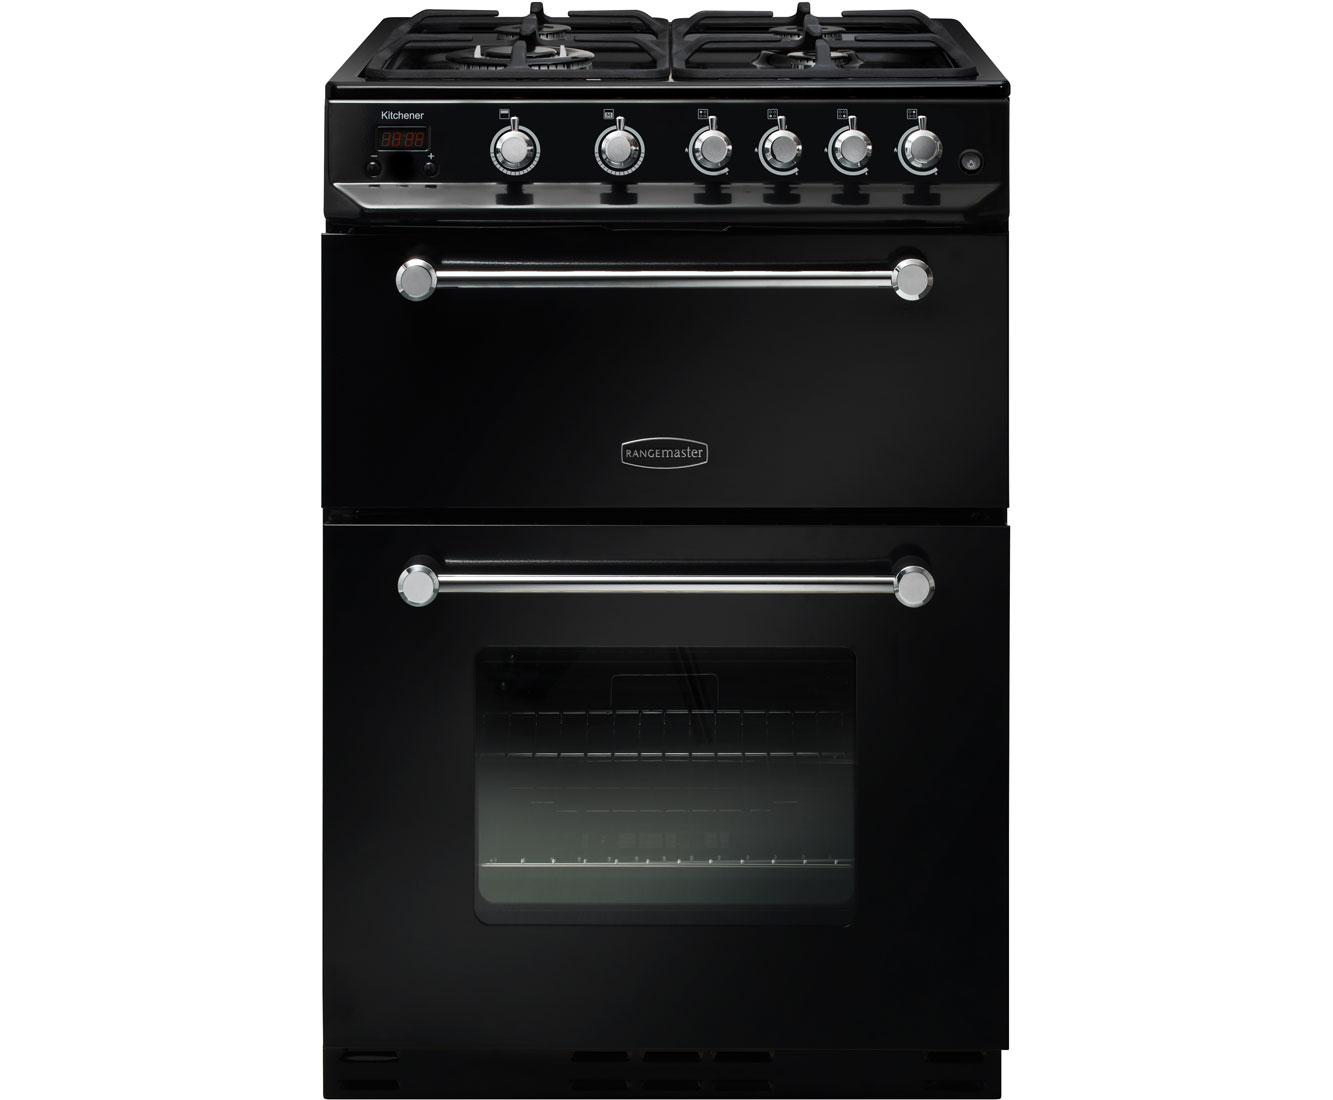 Rangemaster Kitchener 60 KCH60NGFBLC Free Standing Cooker in Black  Chrome